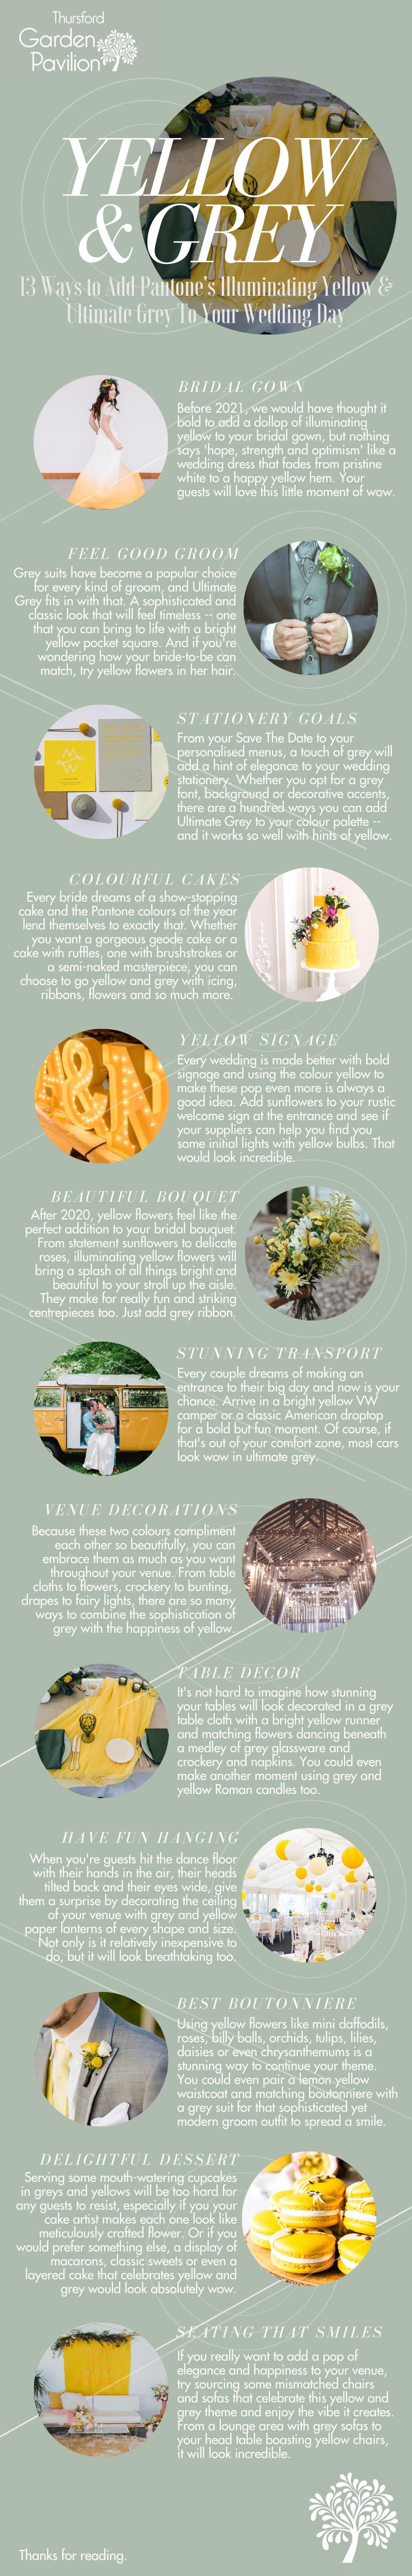 13 Ways To Add Pantone's Yellow & Grey To Your Wedding Day